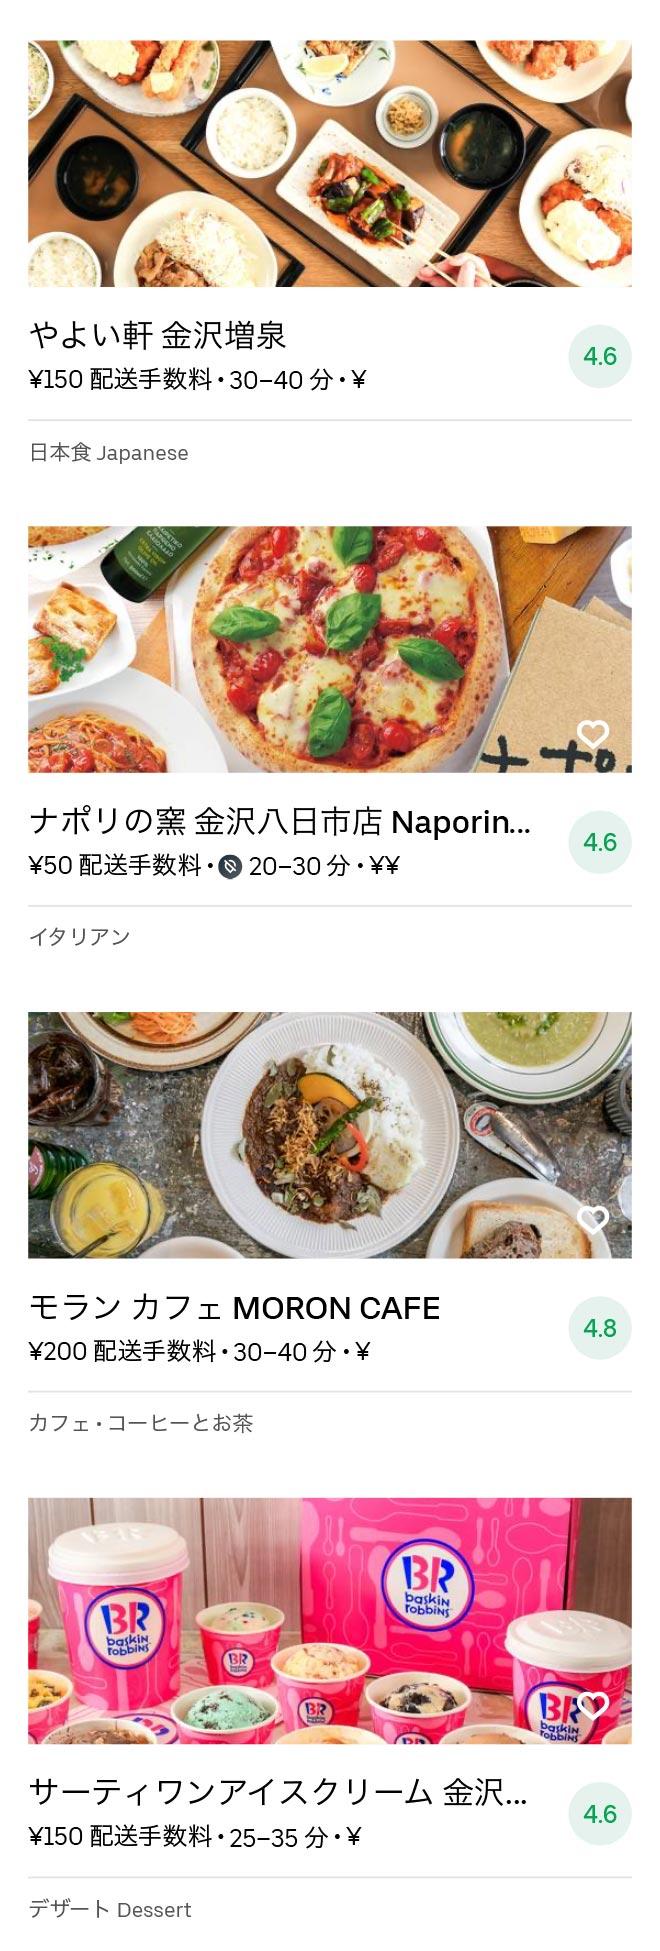 Nishi kanazawa menu 2009 06